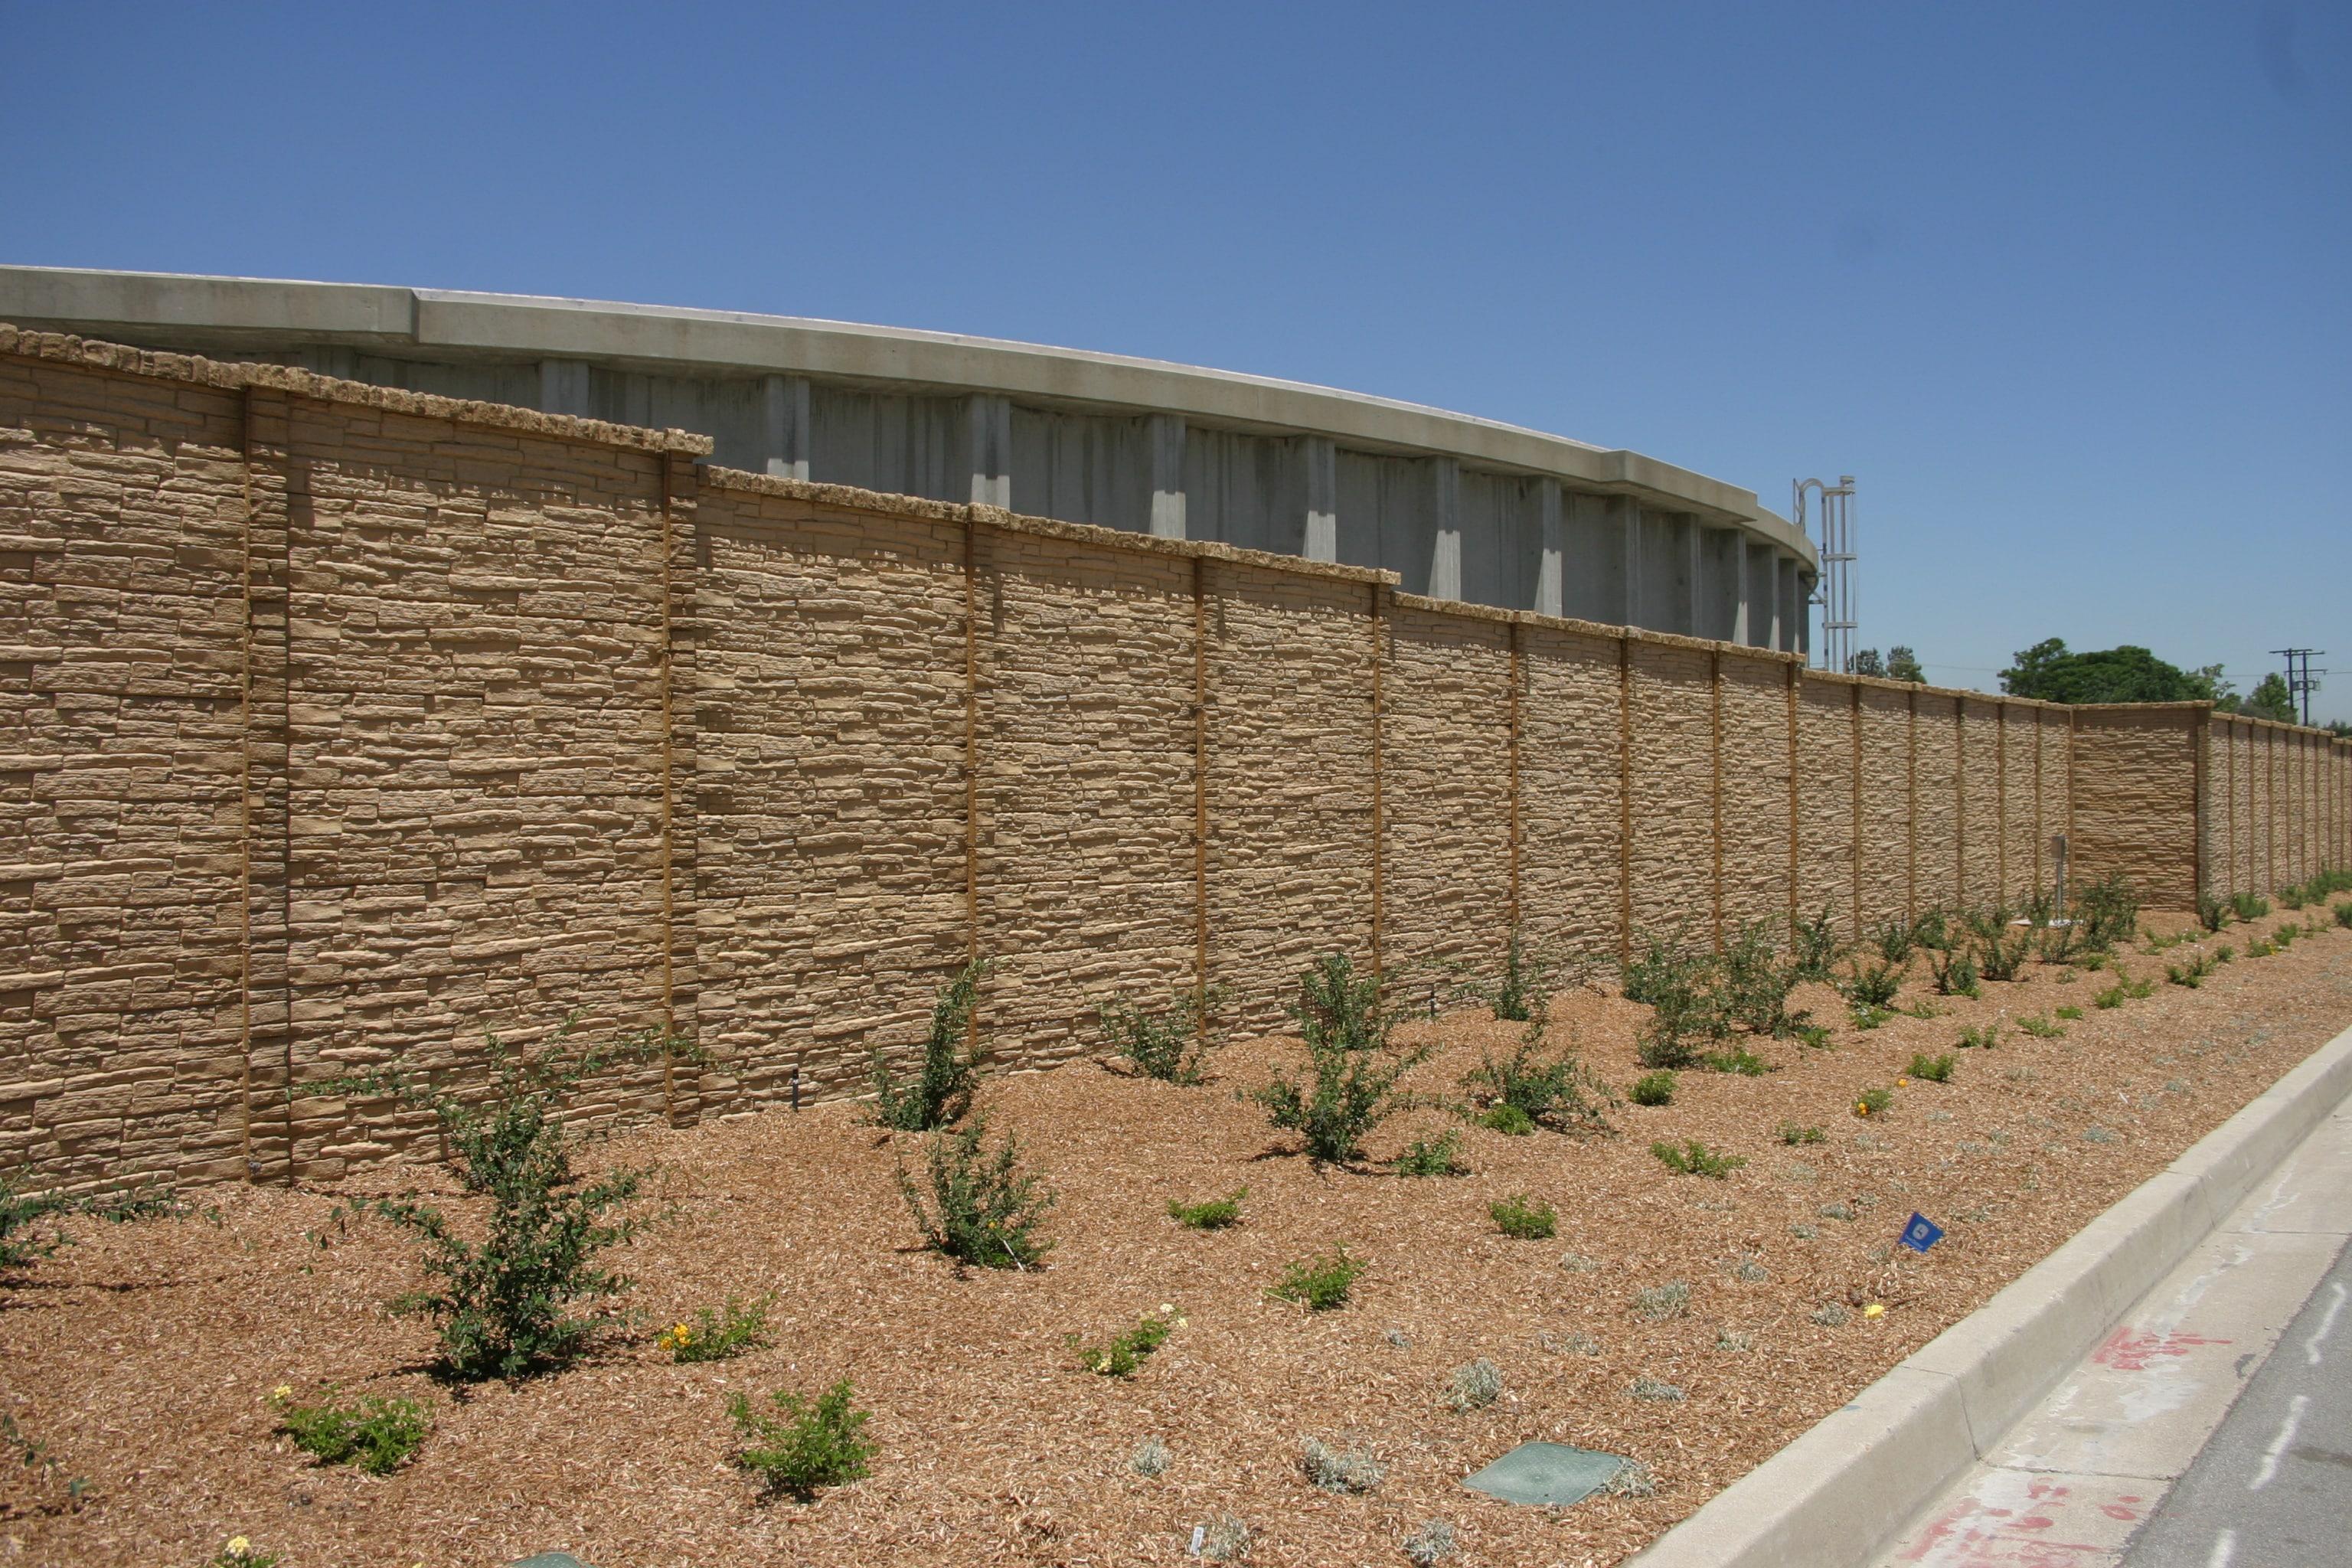 precast concrete screening wall